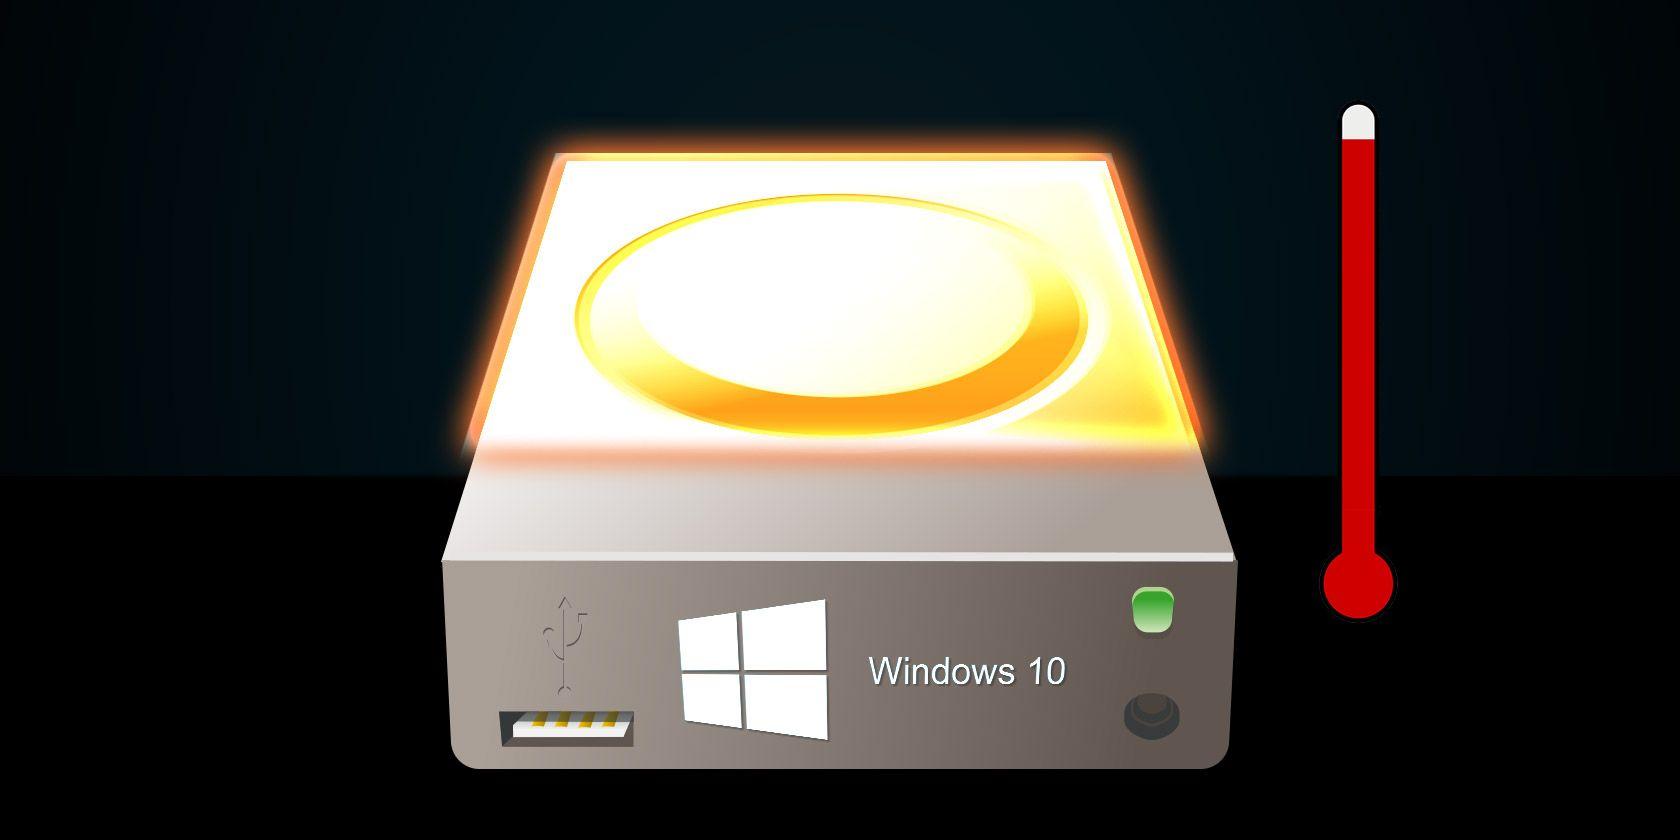 Chto delat', esli process msmpeng.exe (Antimalware Service Executable) gruzit processor ili disk komp'jutera